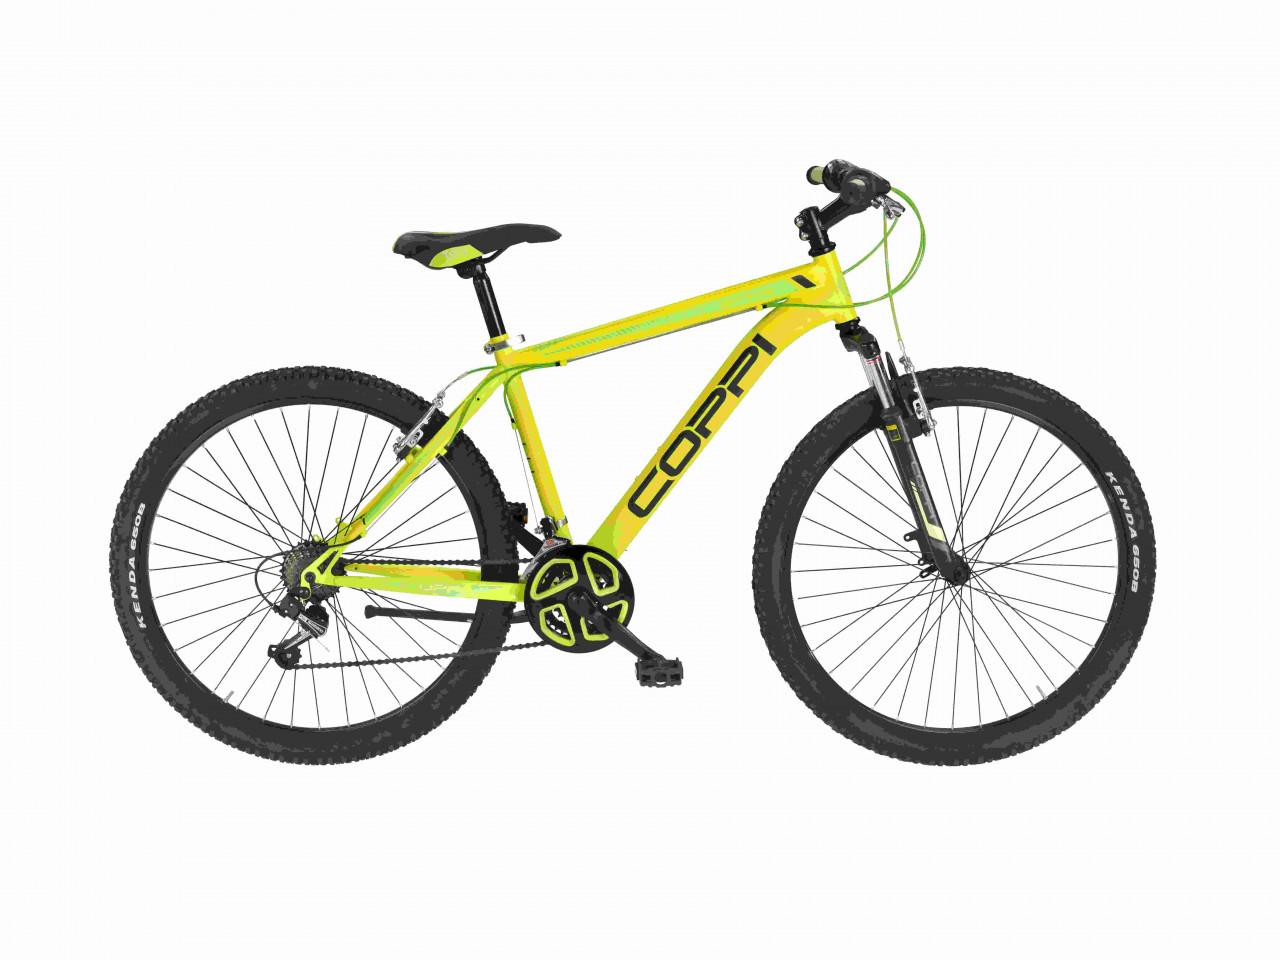 27,5 Zoll Mountainbike MTB Coppi Brave 21 Gänge Federgabel